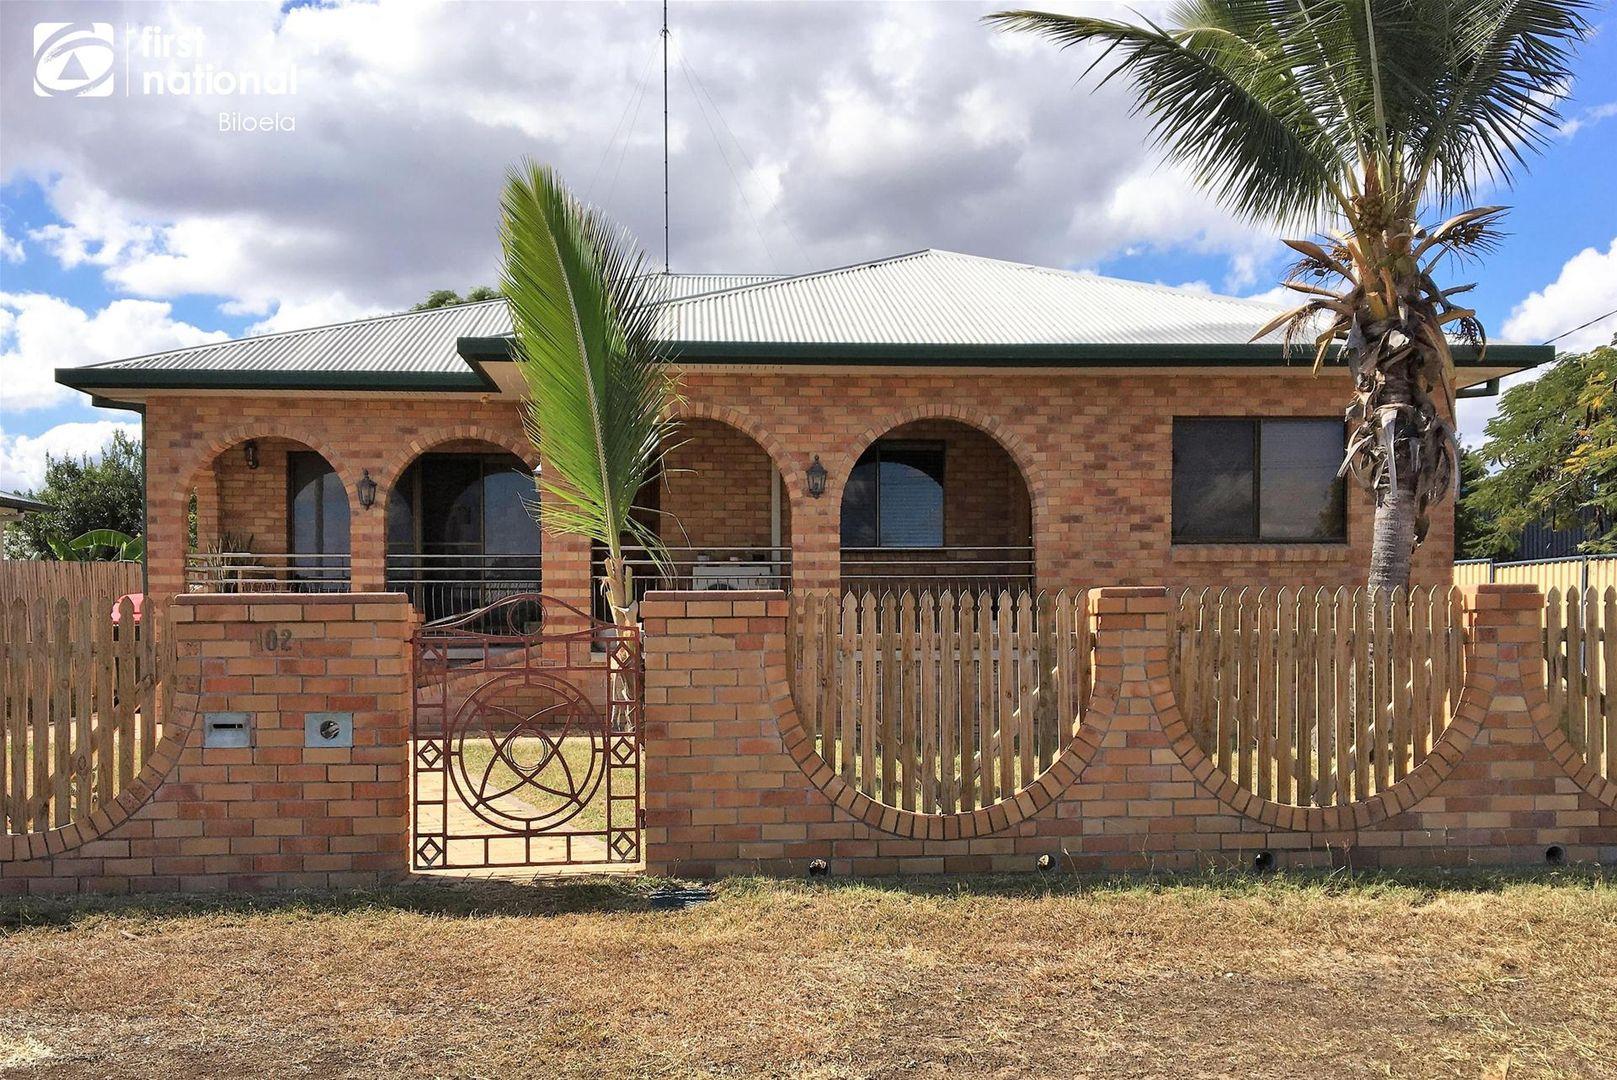 102 Kariboe Street, Biloela QLD 4715, Image 0